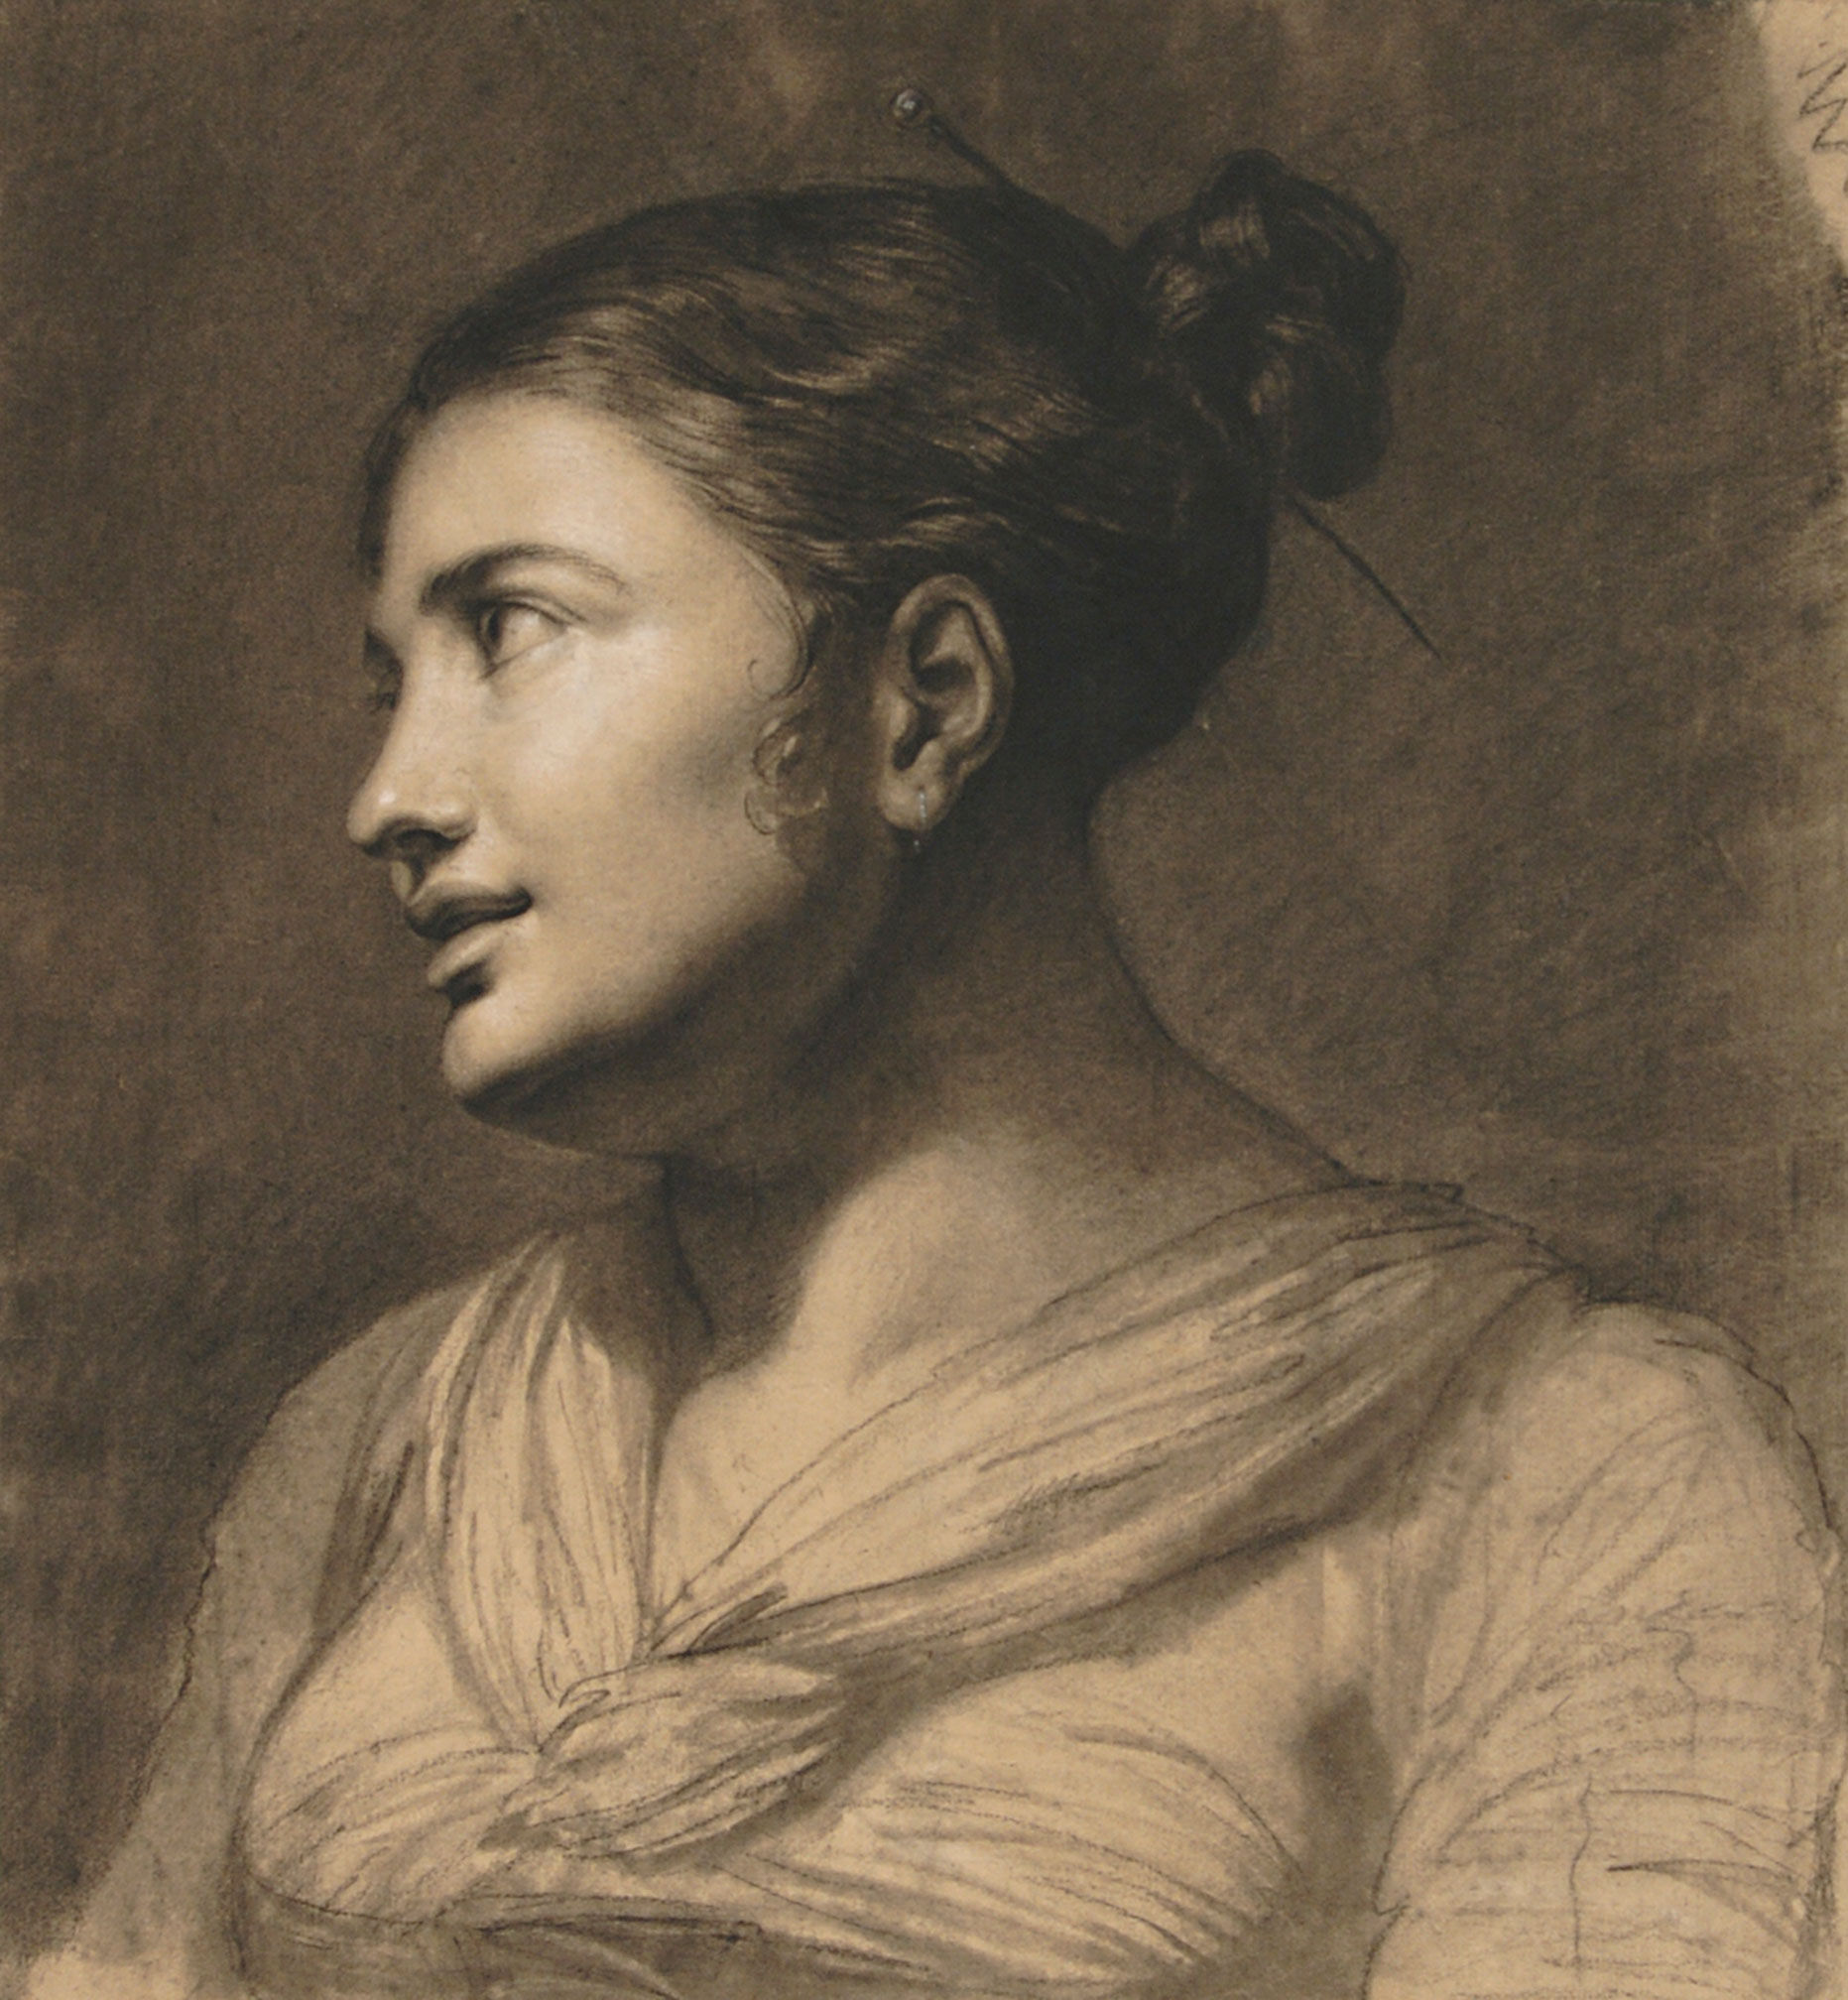 1850 Pauline Auzou, Portrait of a Girl